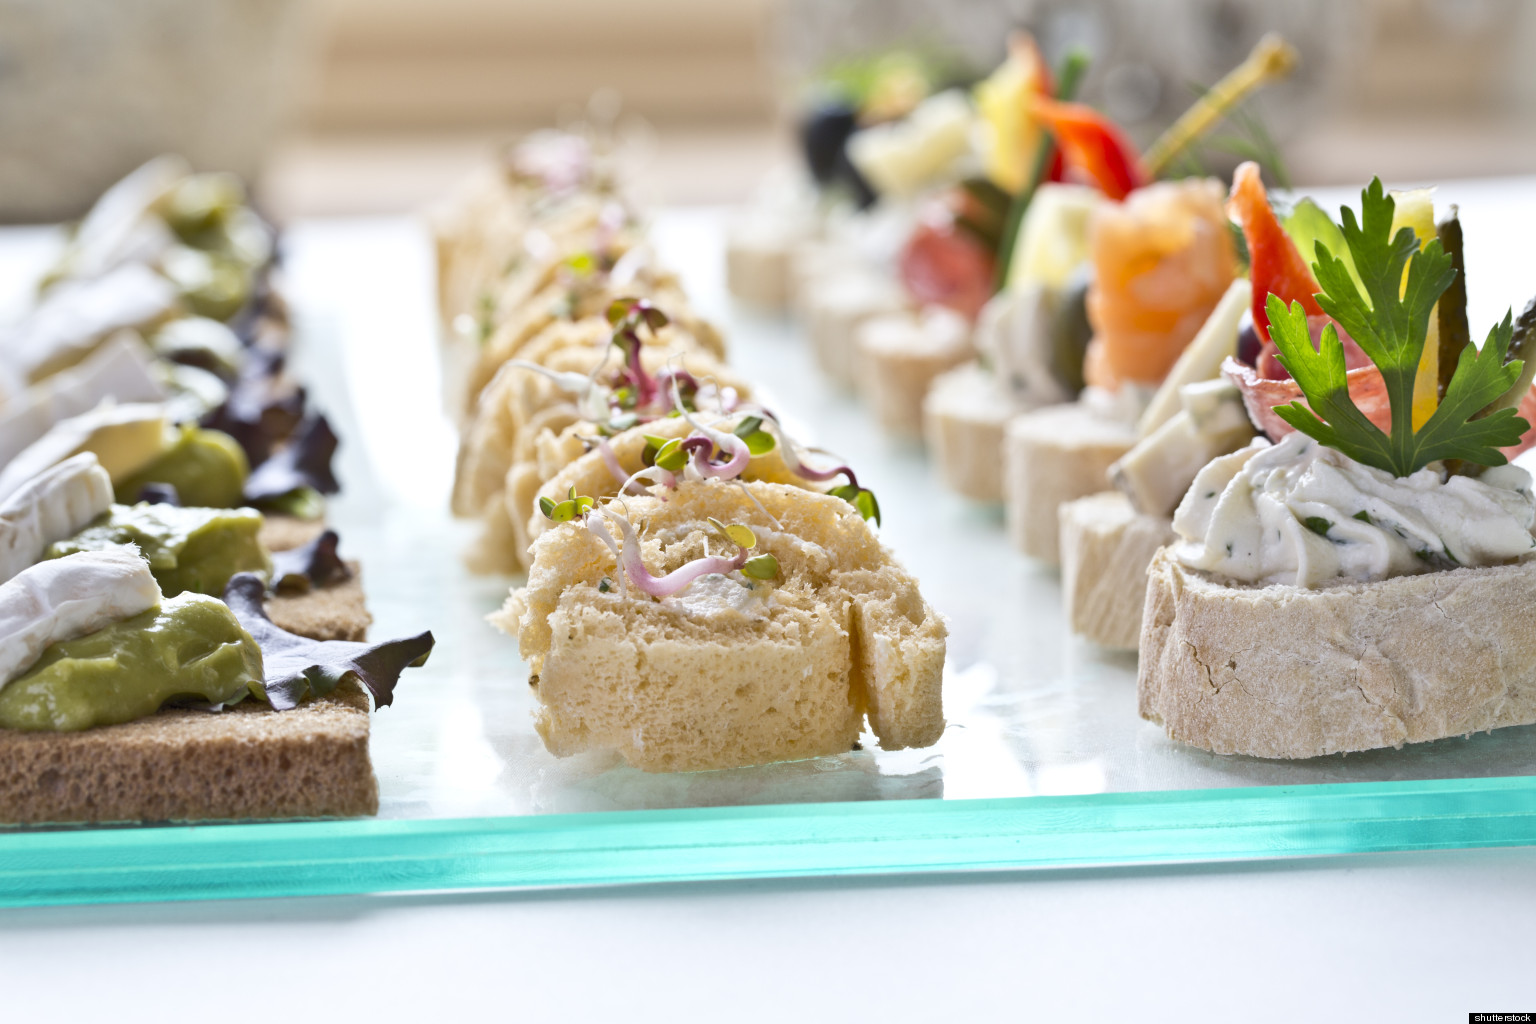 Snacks for teen gatherings